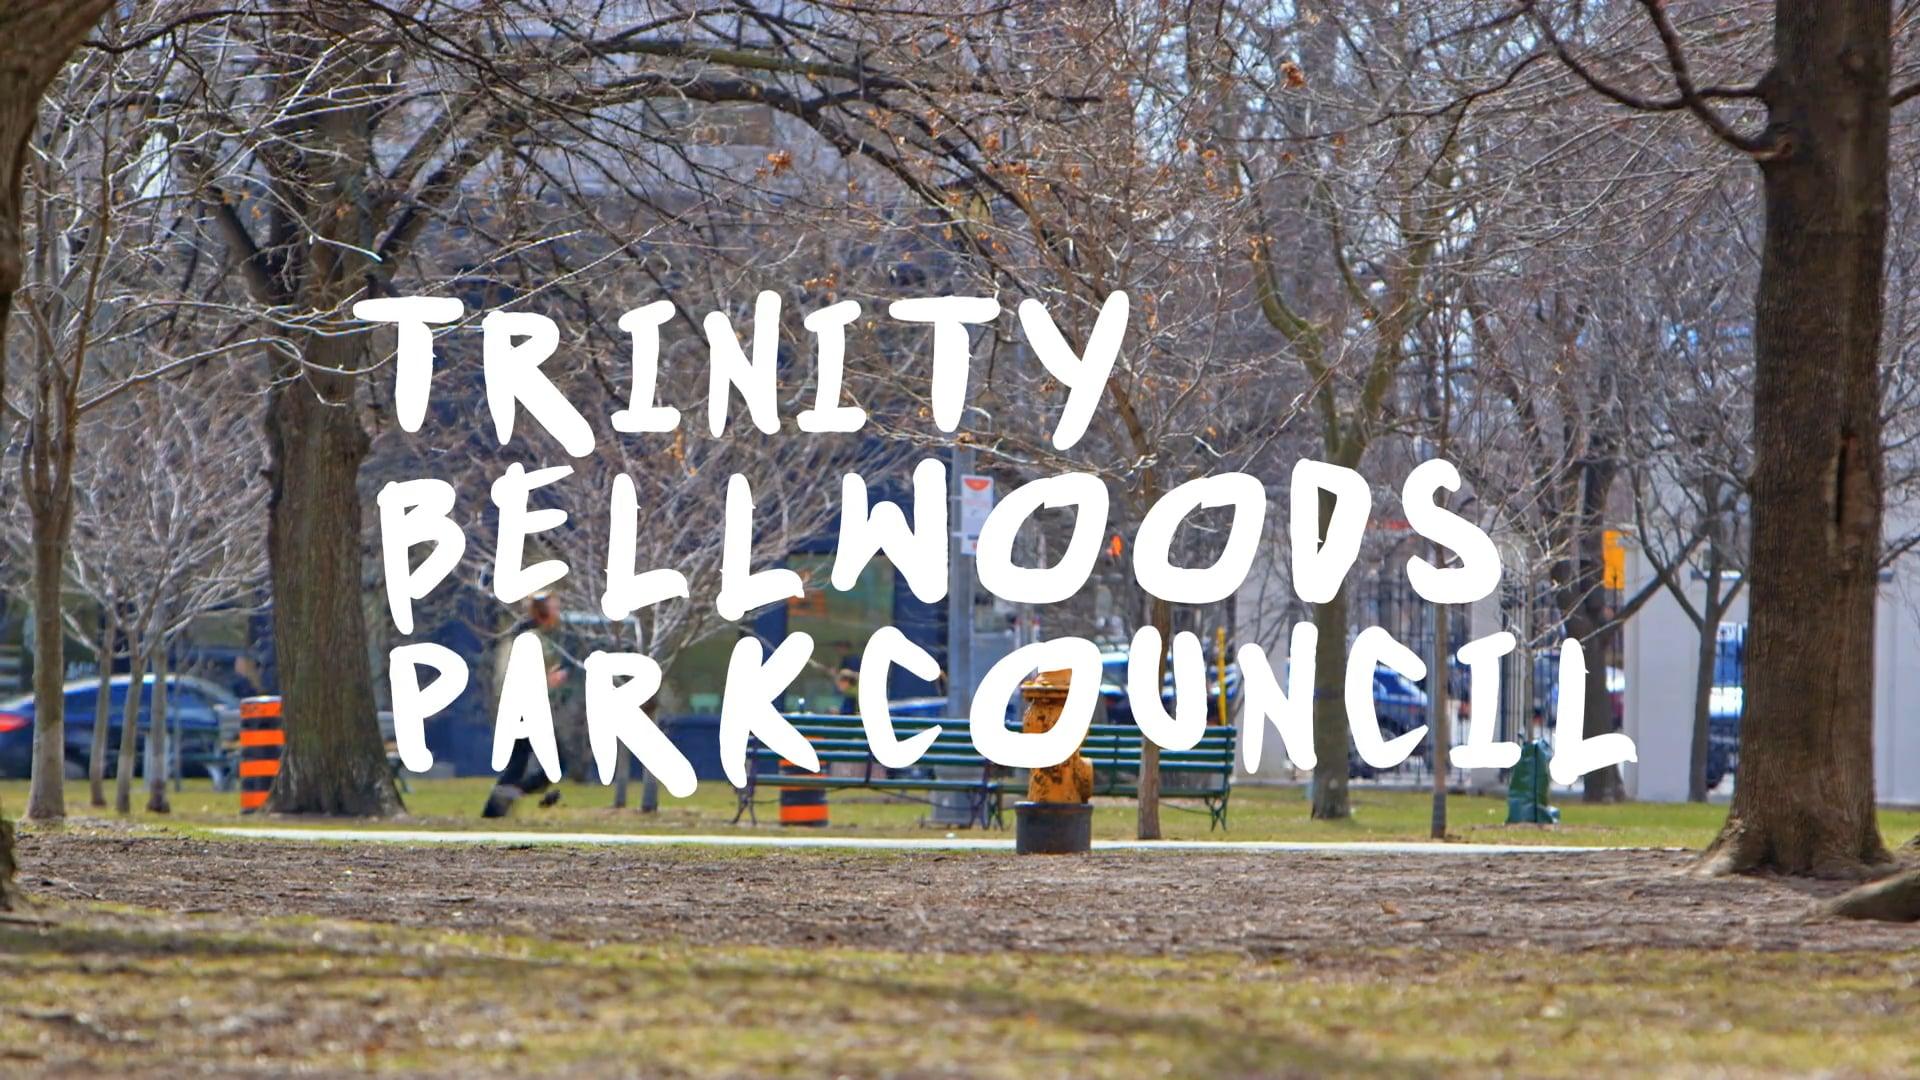 TORONTOPIA - TRINITY BELLWOODS PARK COUNCIL